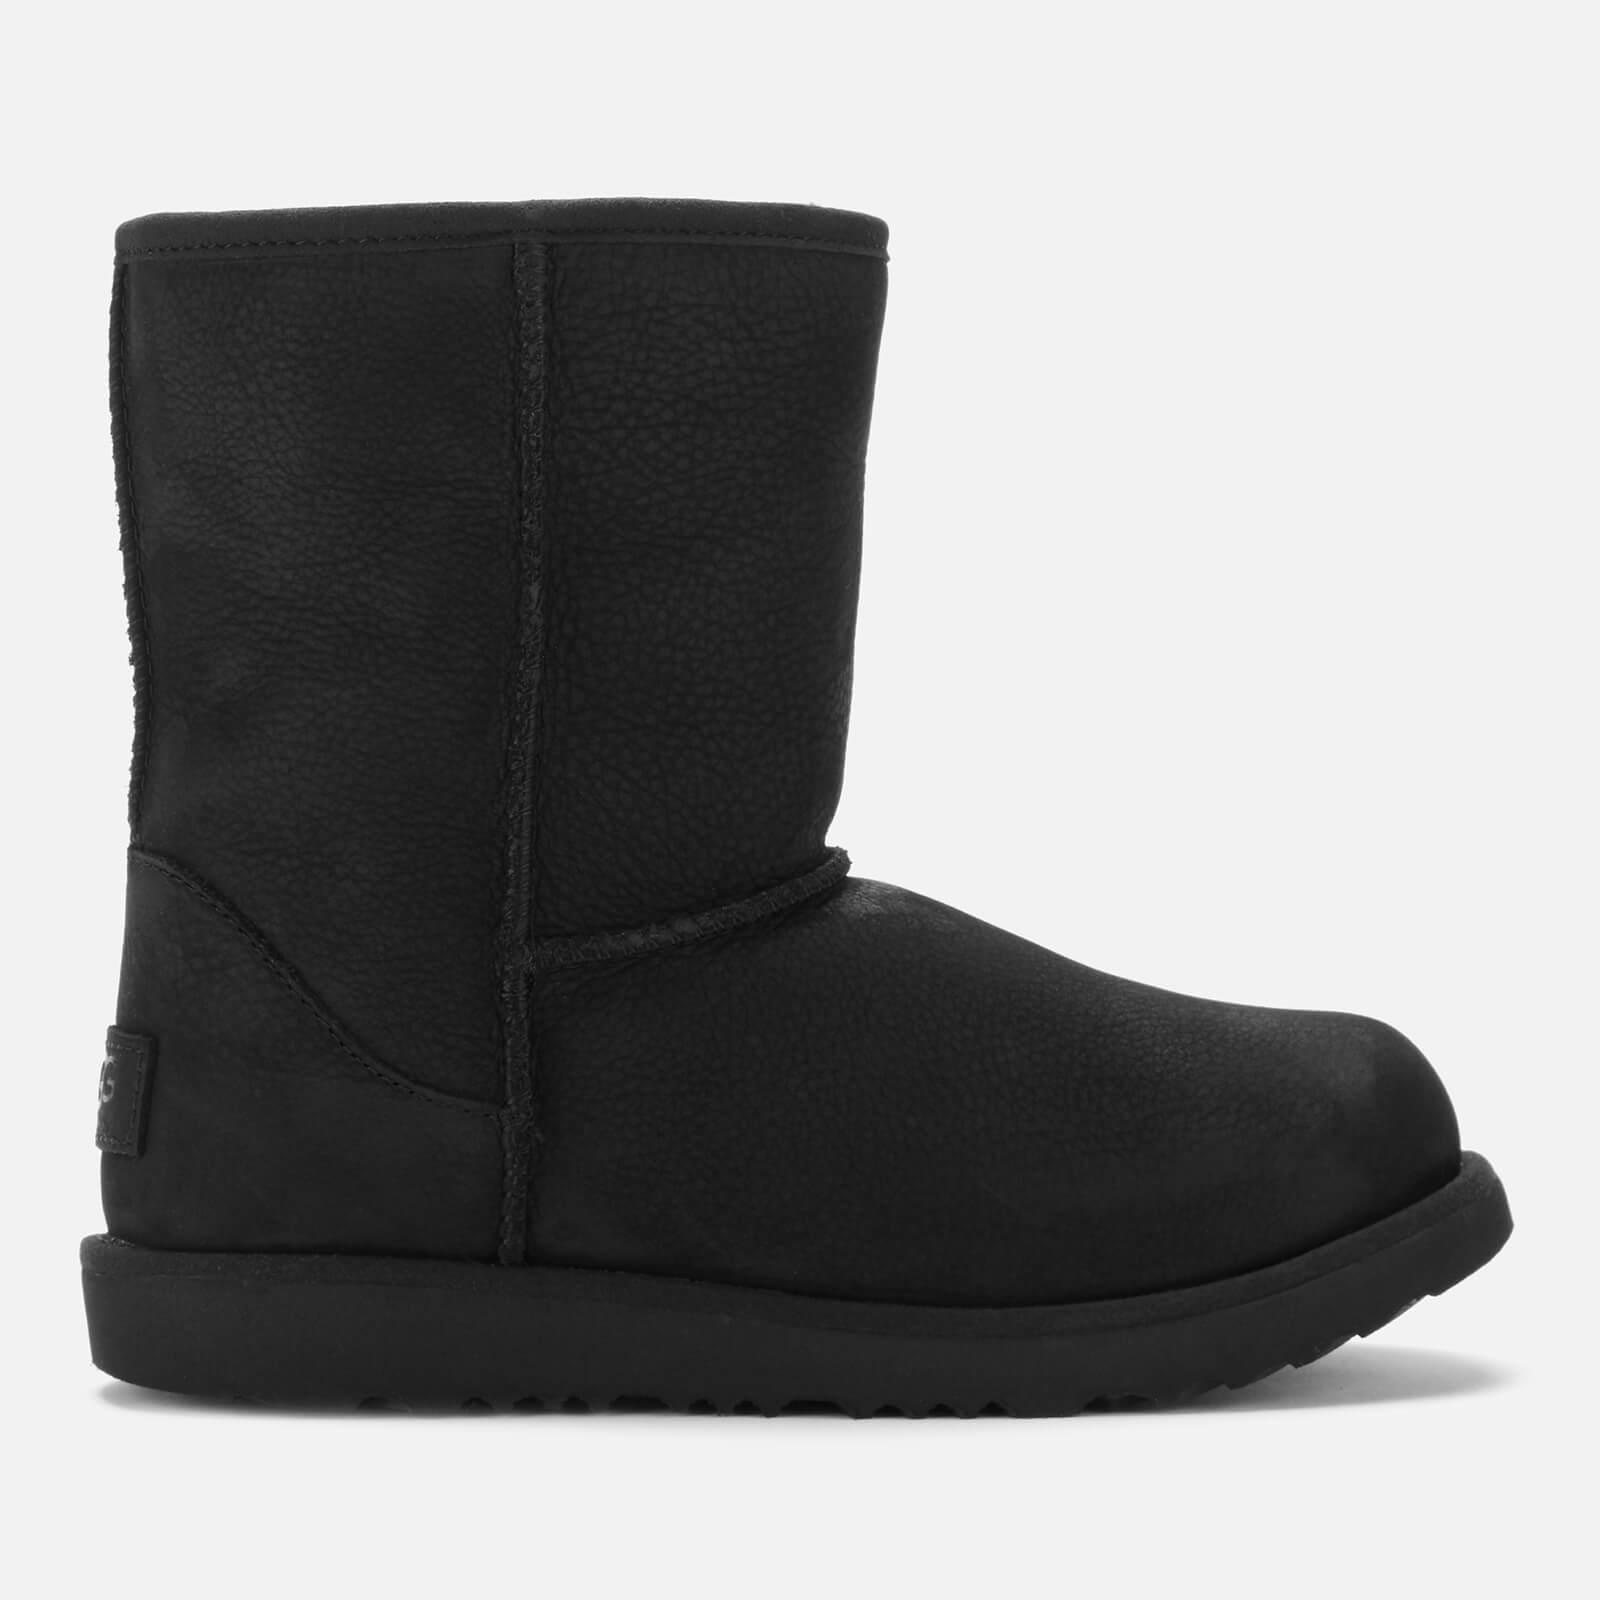 UGG Kids' Classic Short II Waterproof Boots - Black - UK 12 Kids